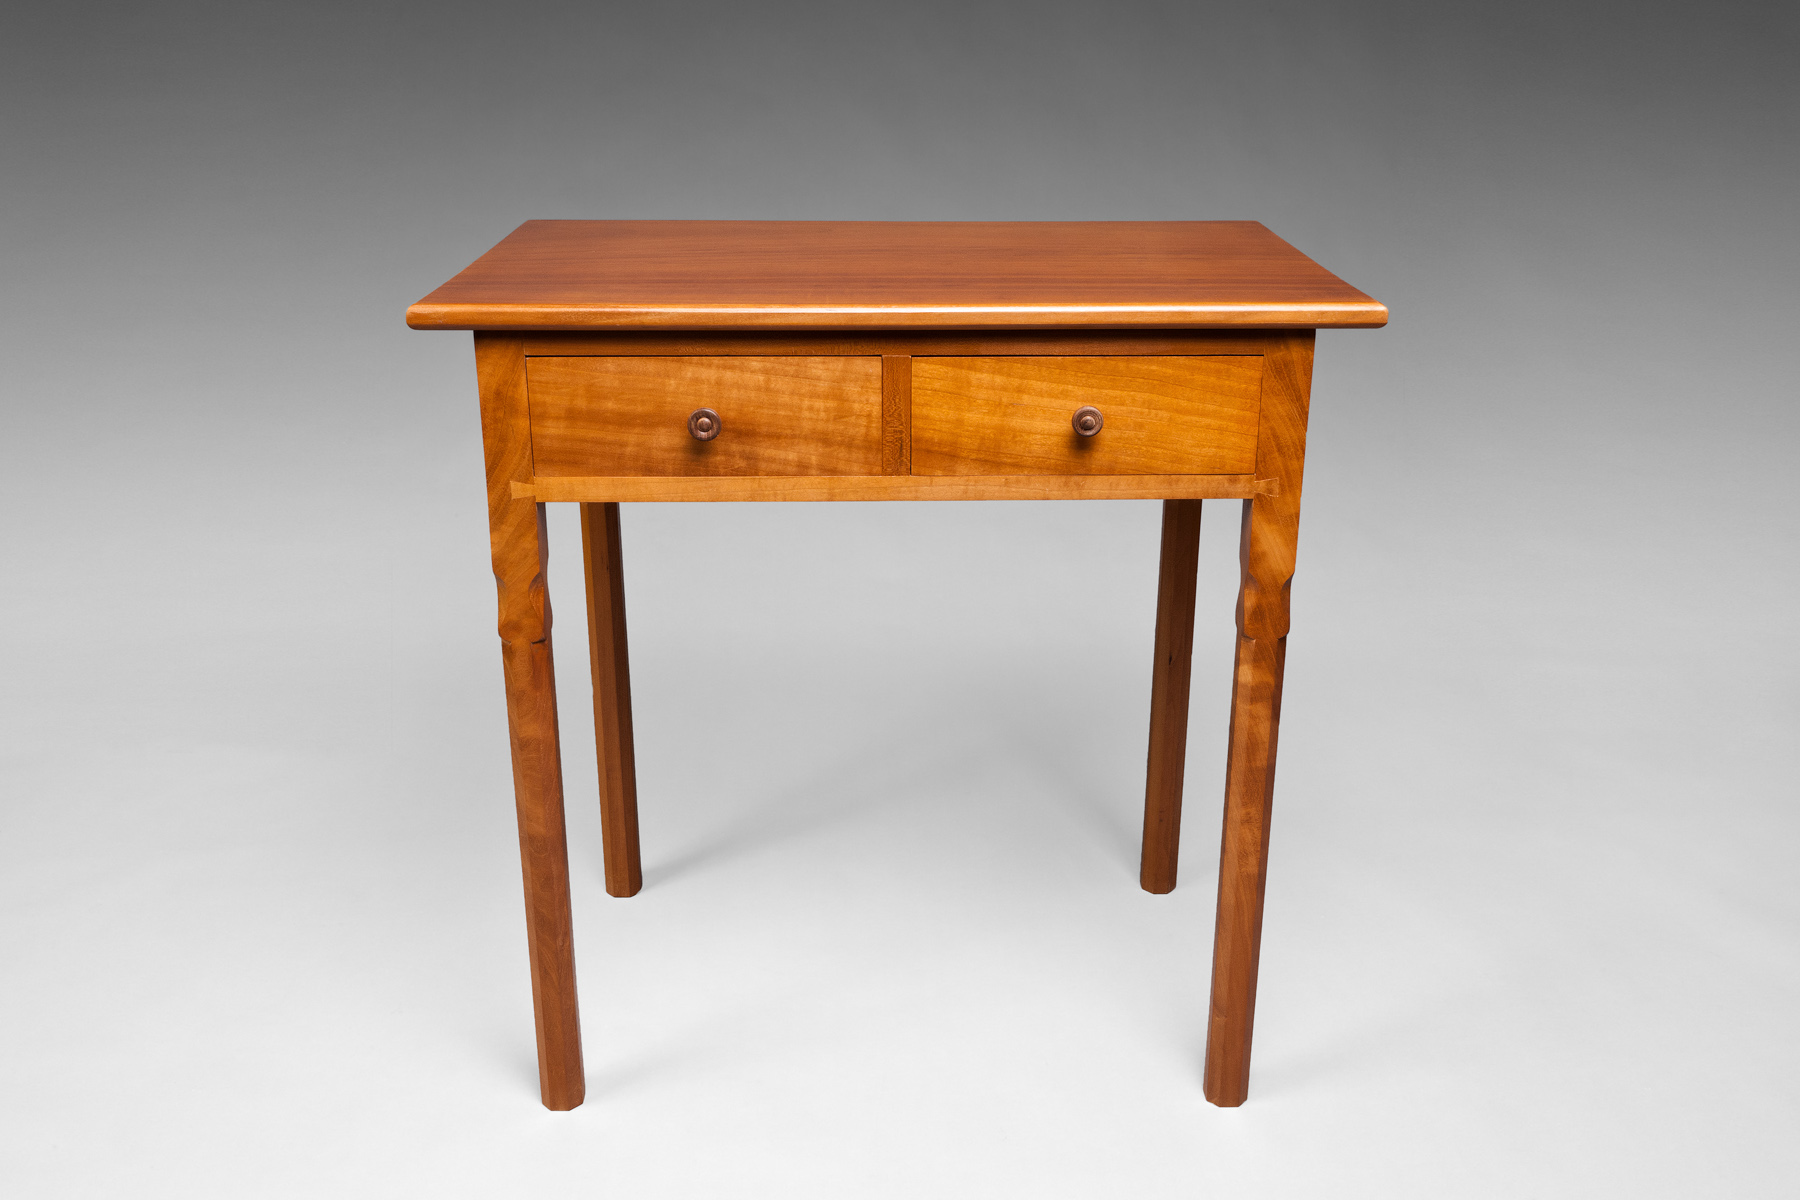 rob cart table 2-1434 - FINAL.jpg